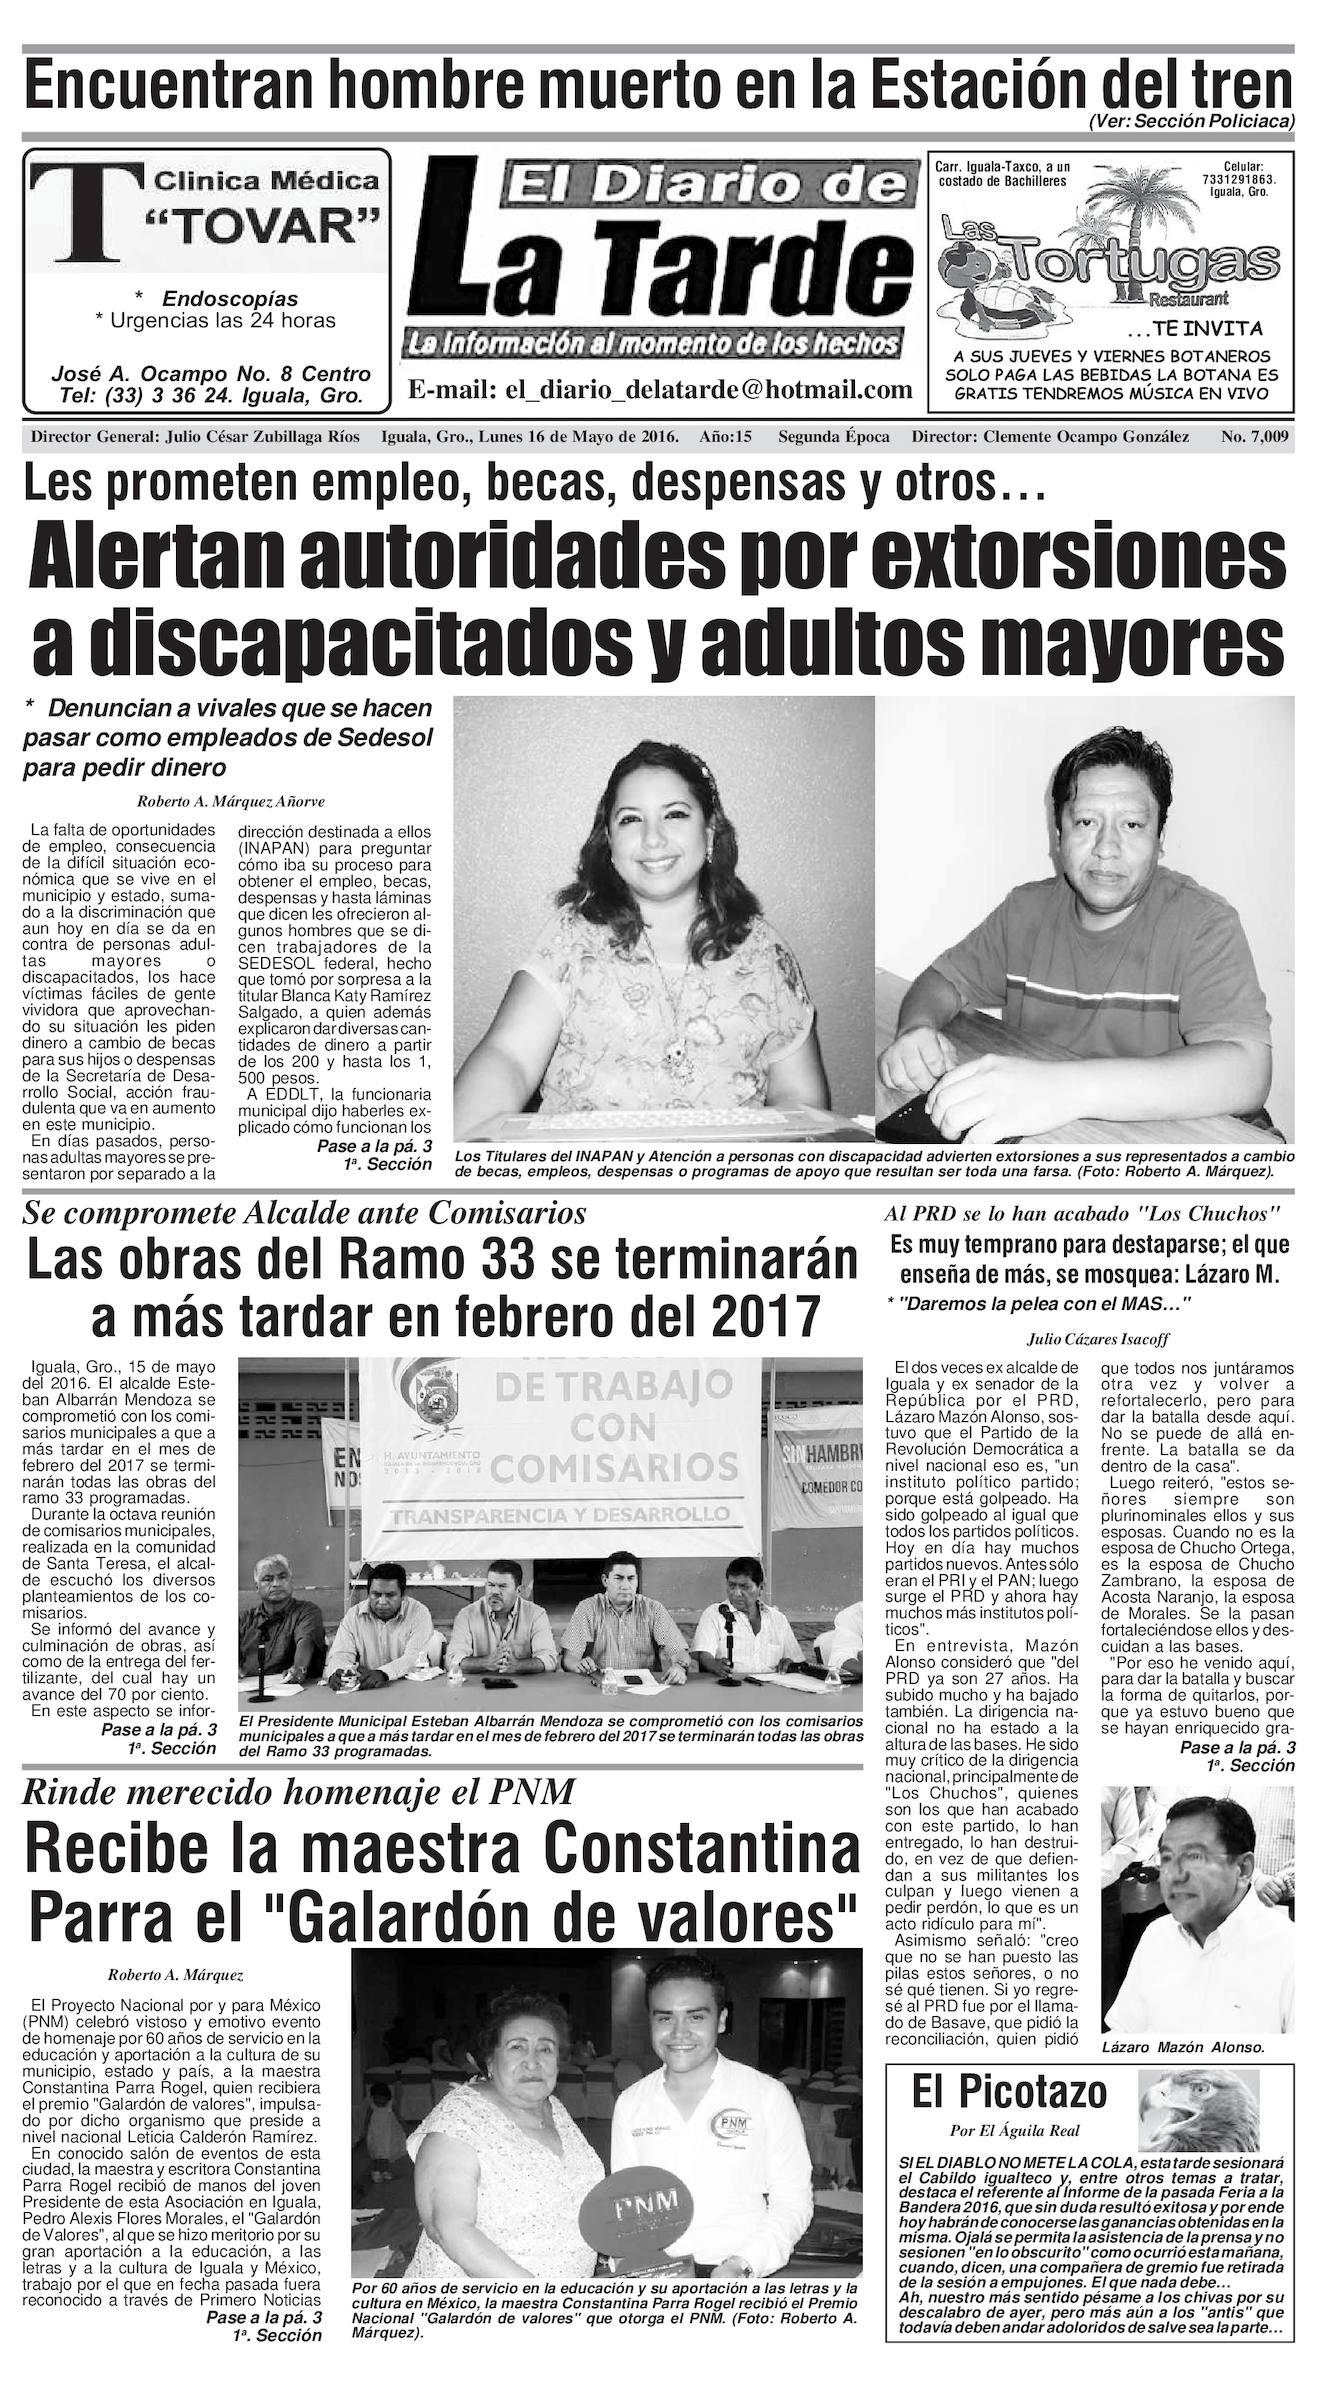 Calaméo 16 De Mayo De 2016